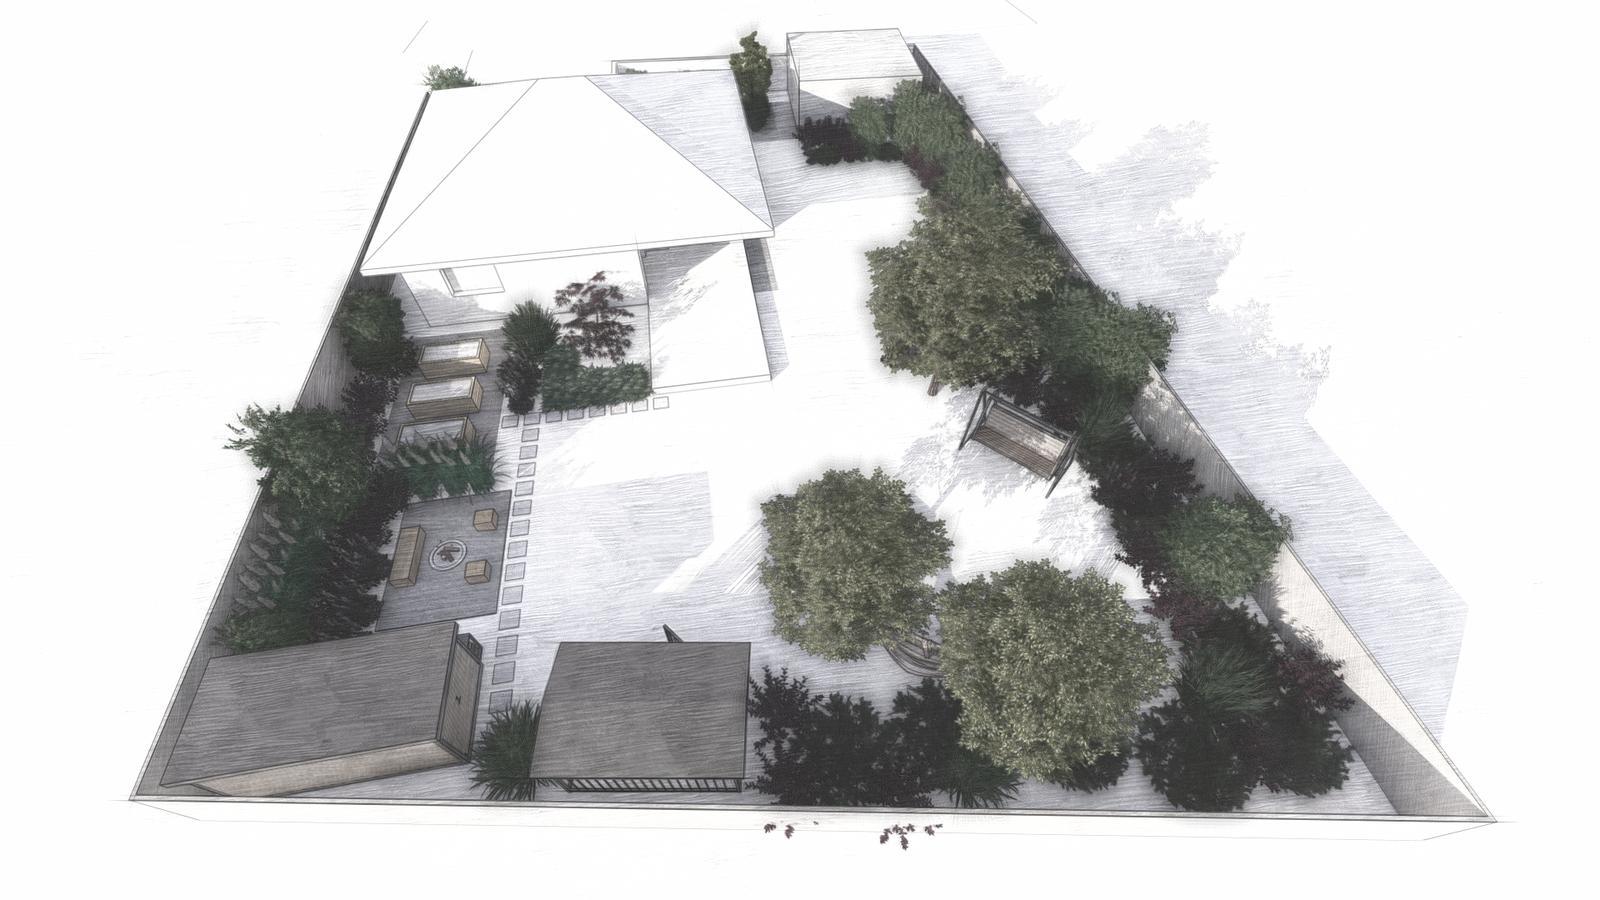 Návrh záhrady rodinného domu - Obrázok č. 4